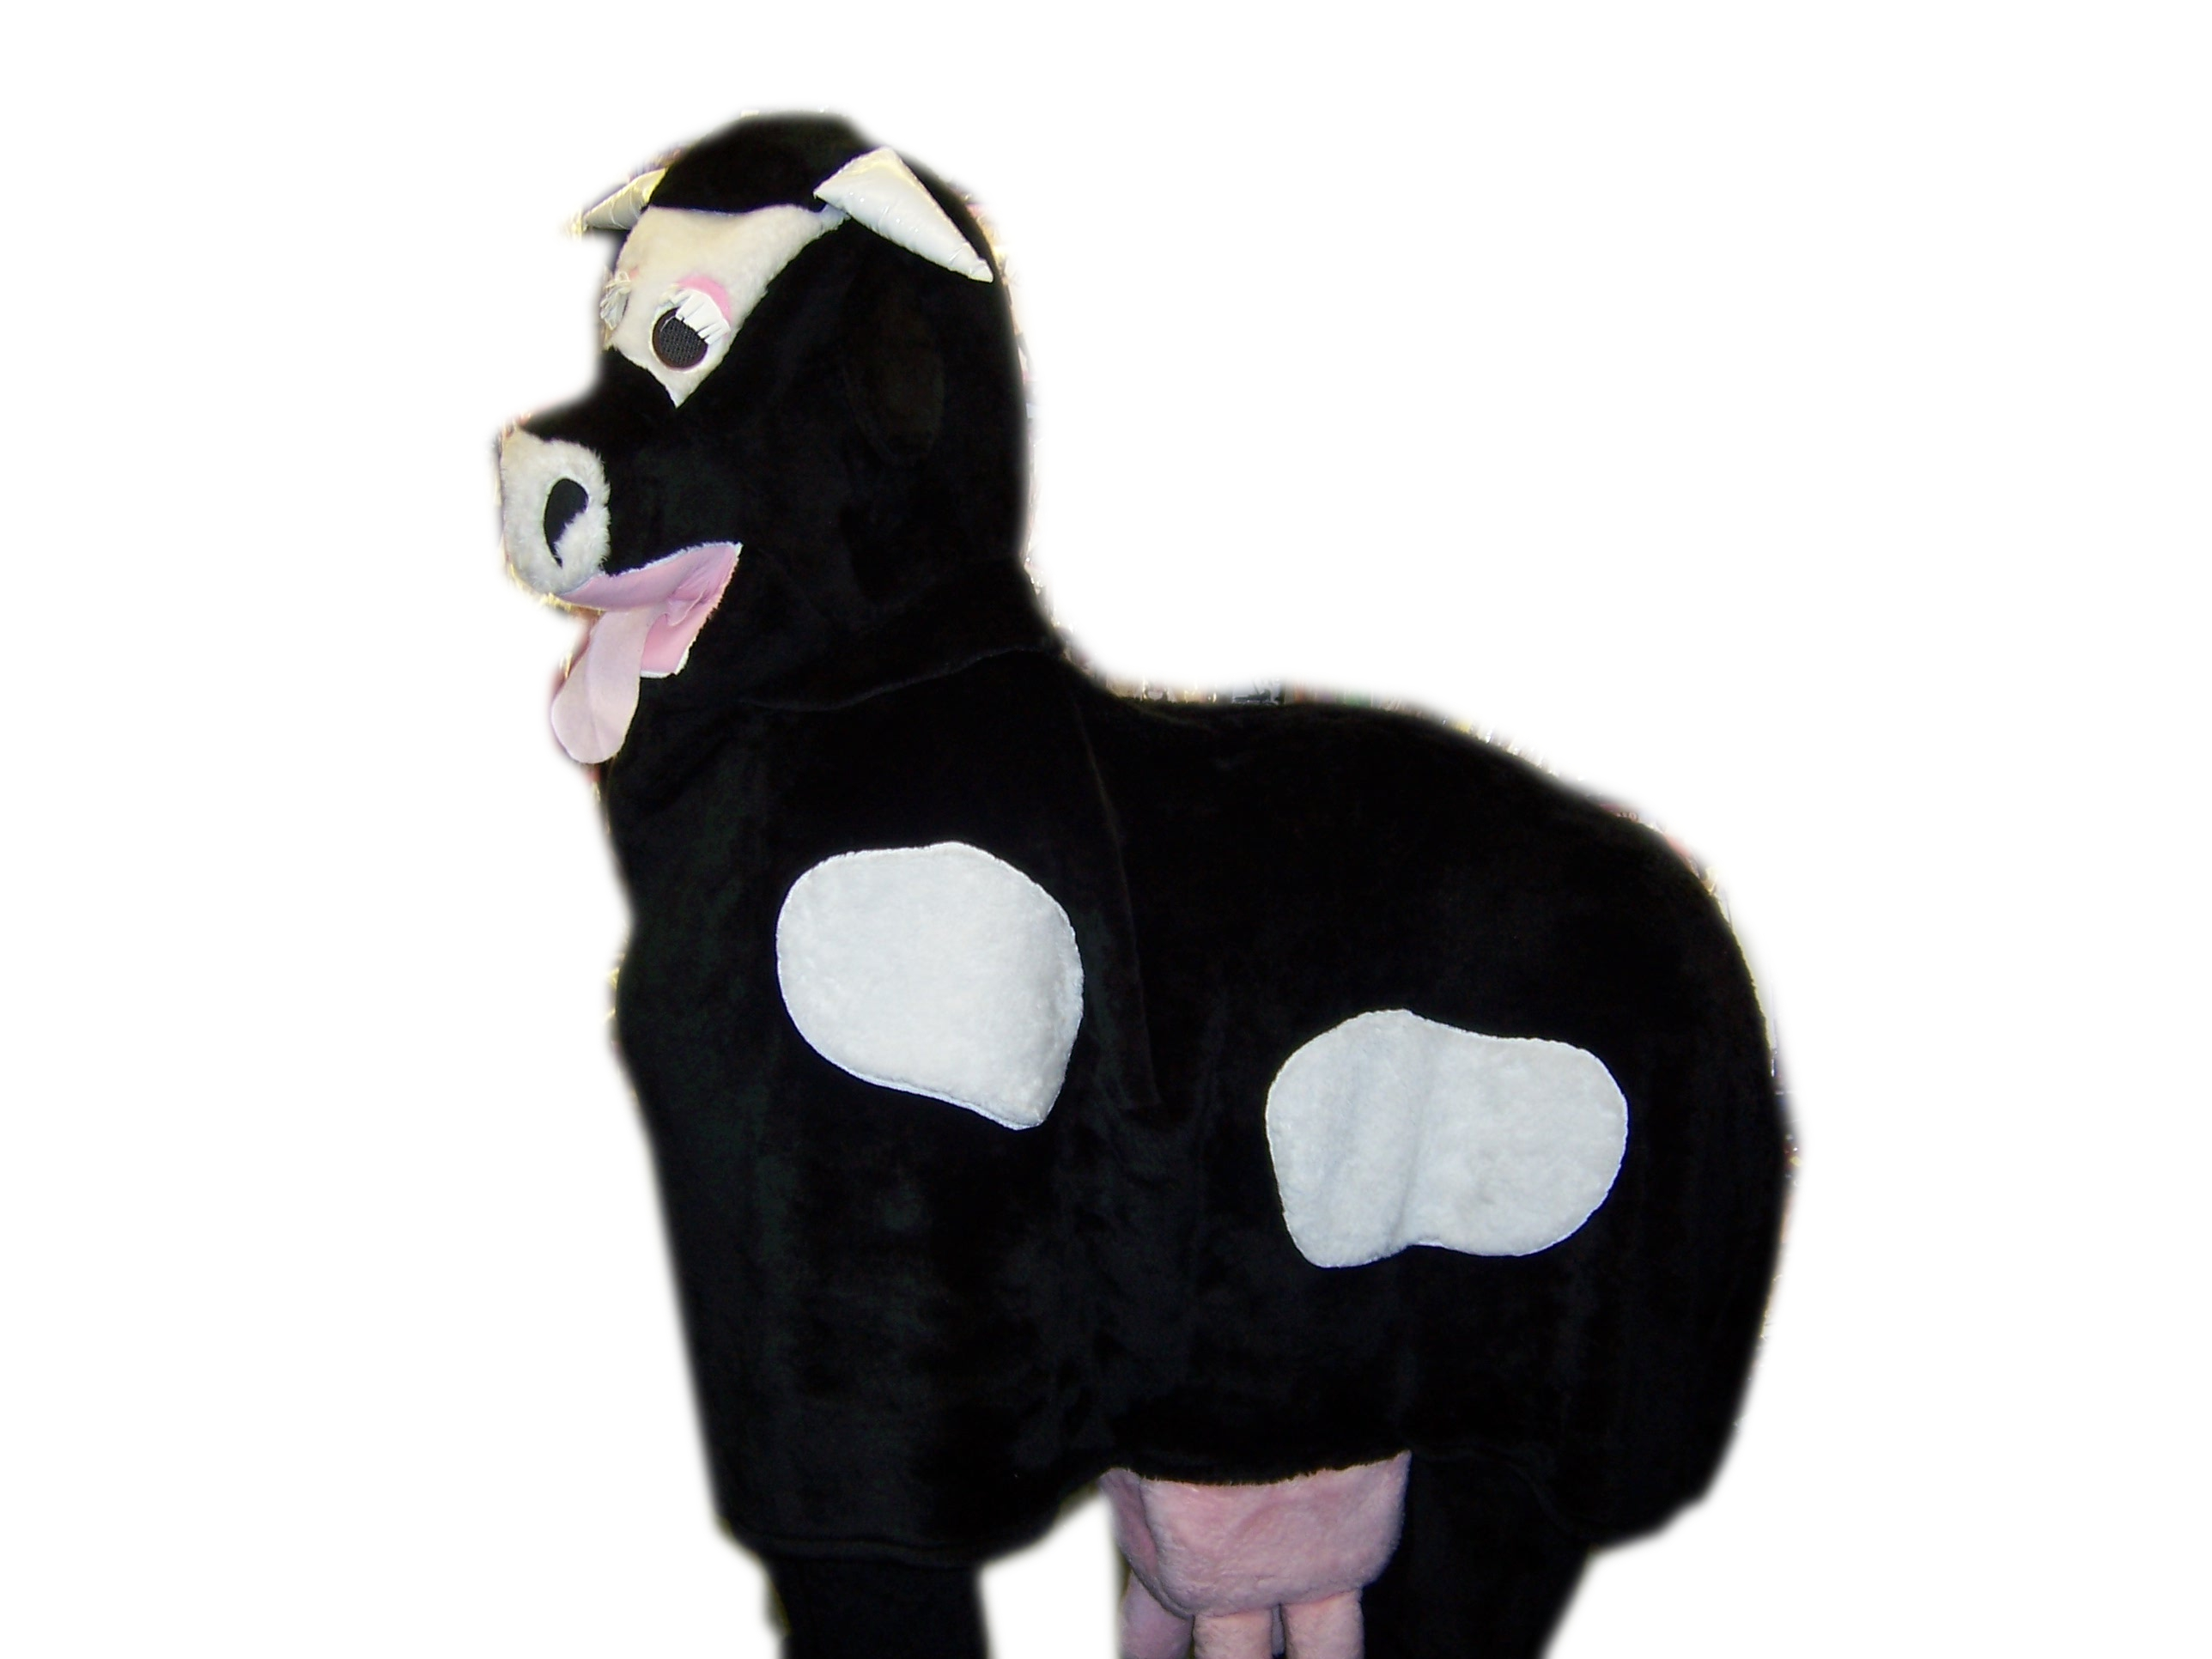 Two_Person_Cow_Costume_Black_&_White